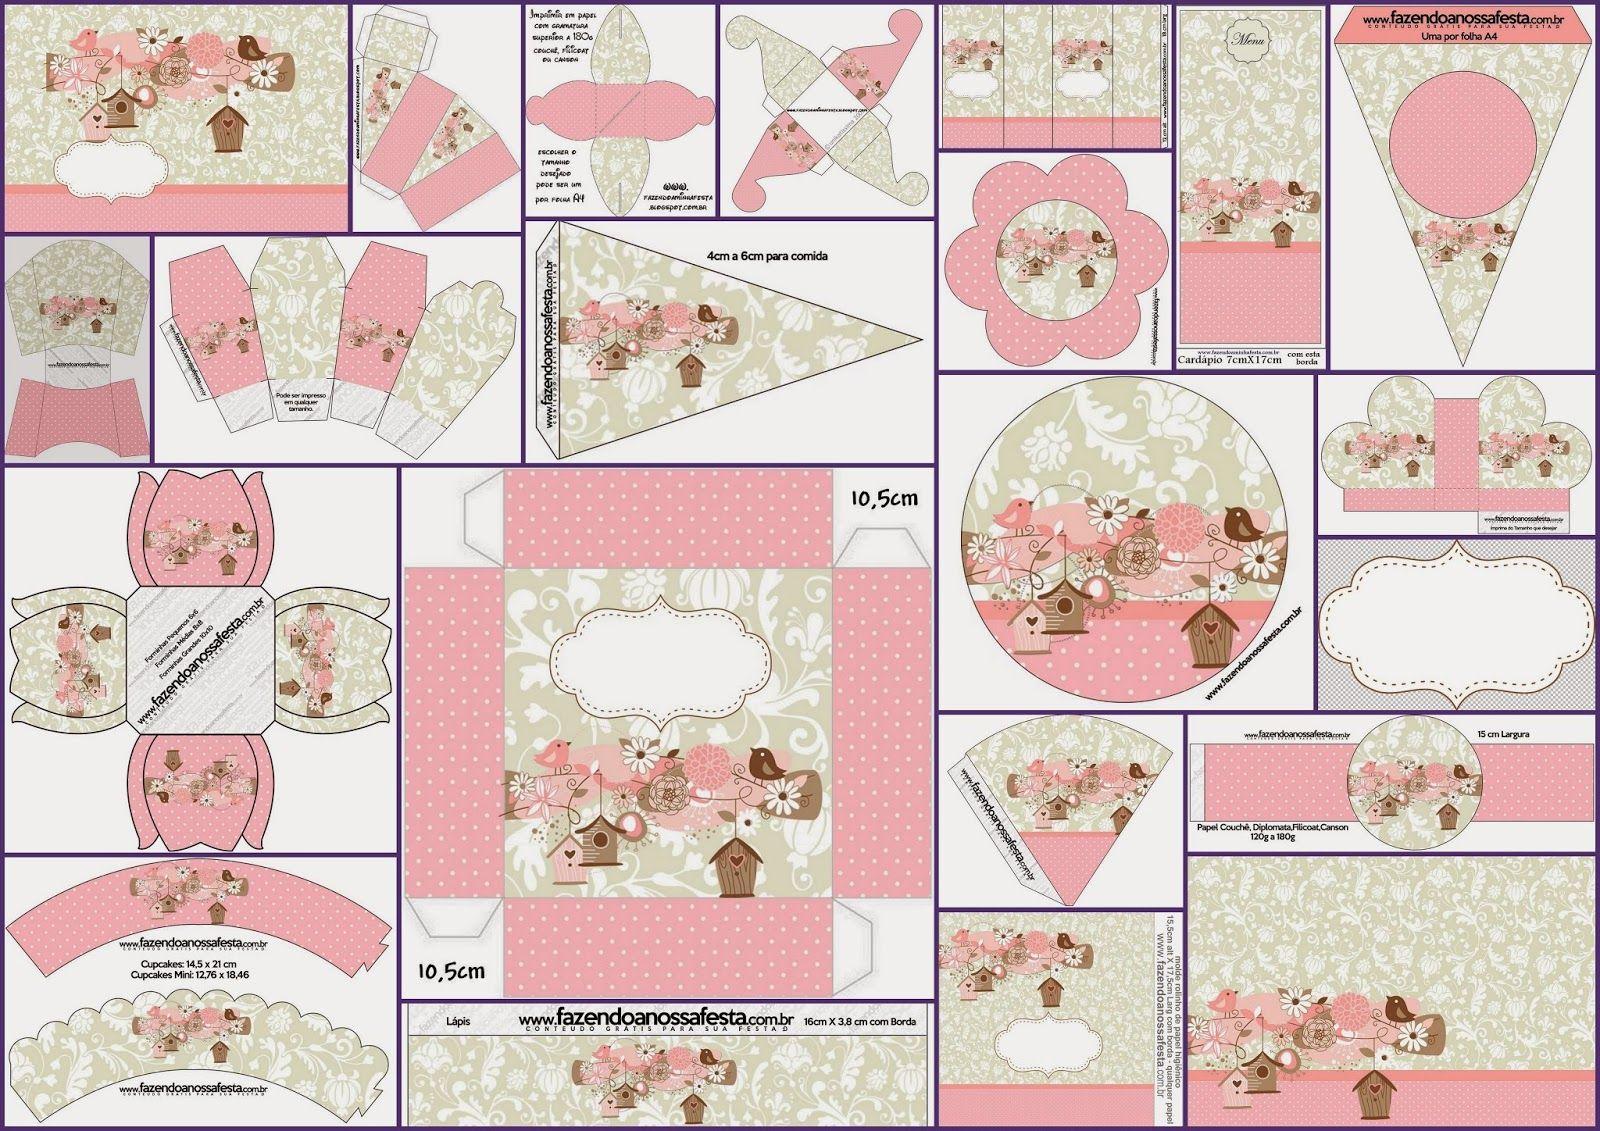 p jaros y jaulas completo kit para fiestas para imprimir gratis baby shower pinterest. Black Bedroom Furniture Sets. Home Design Ideas